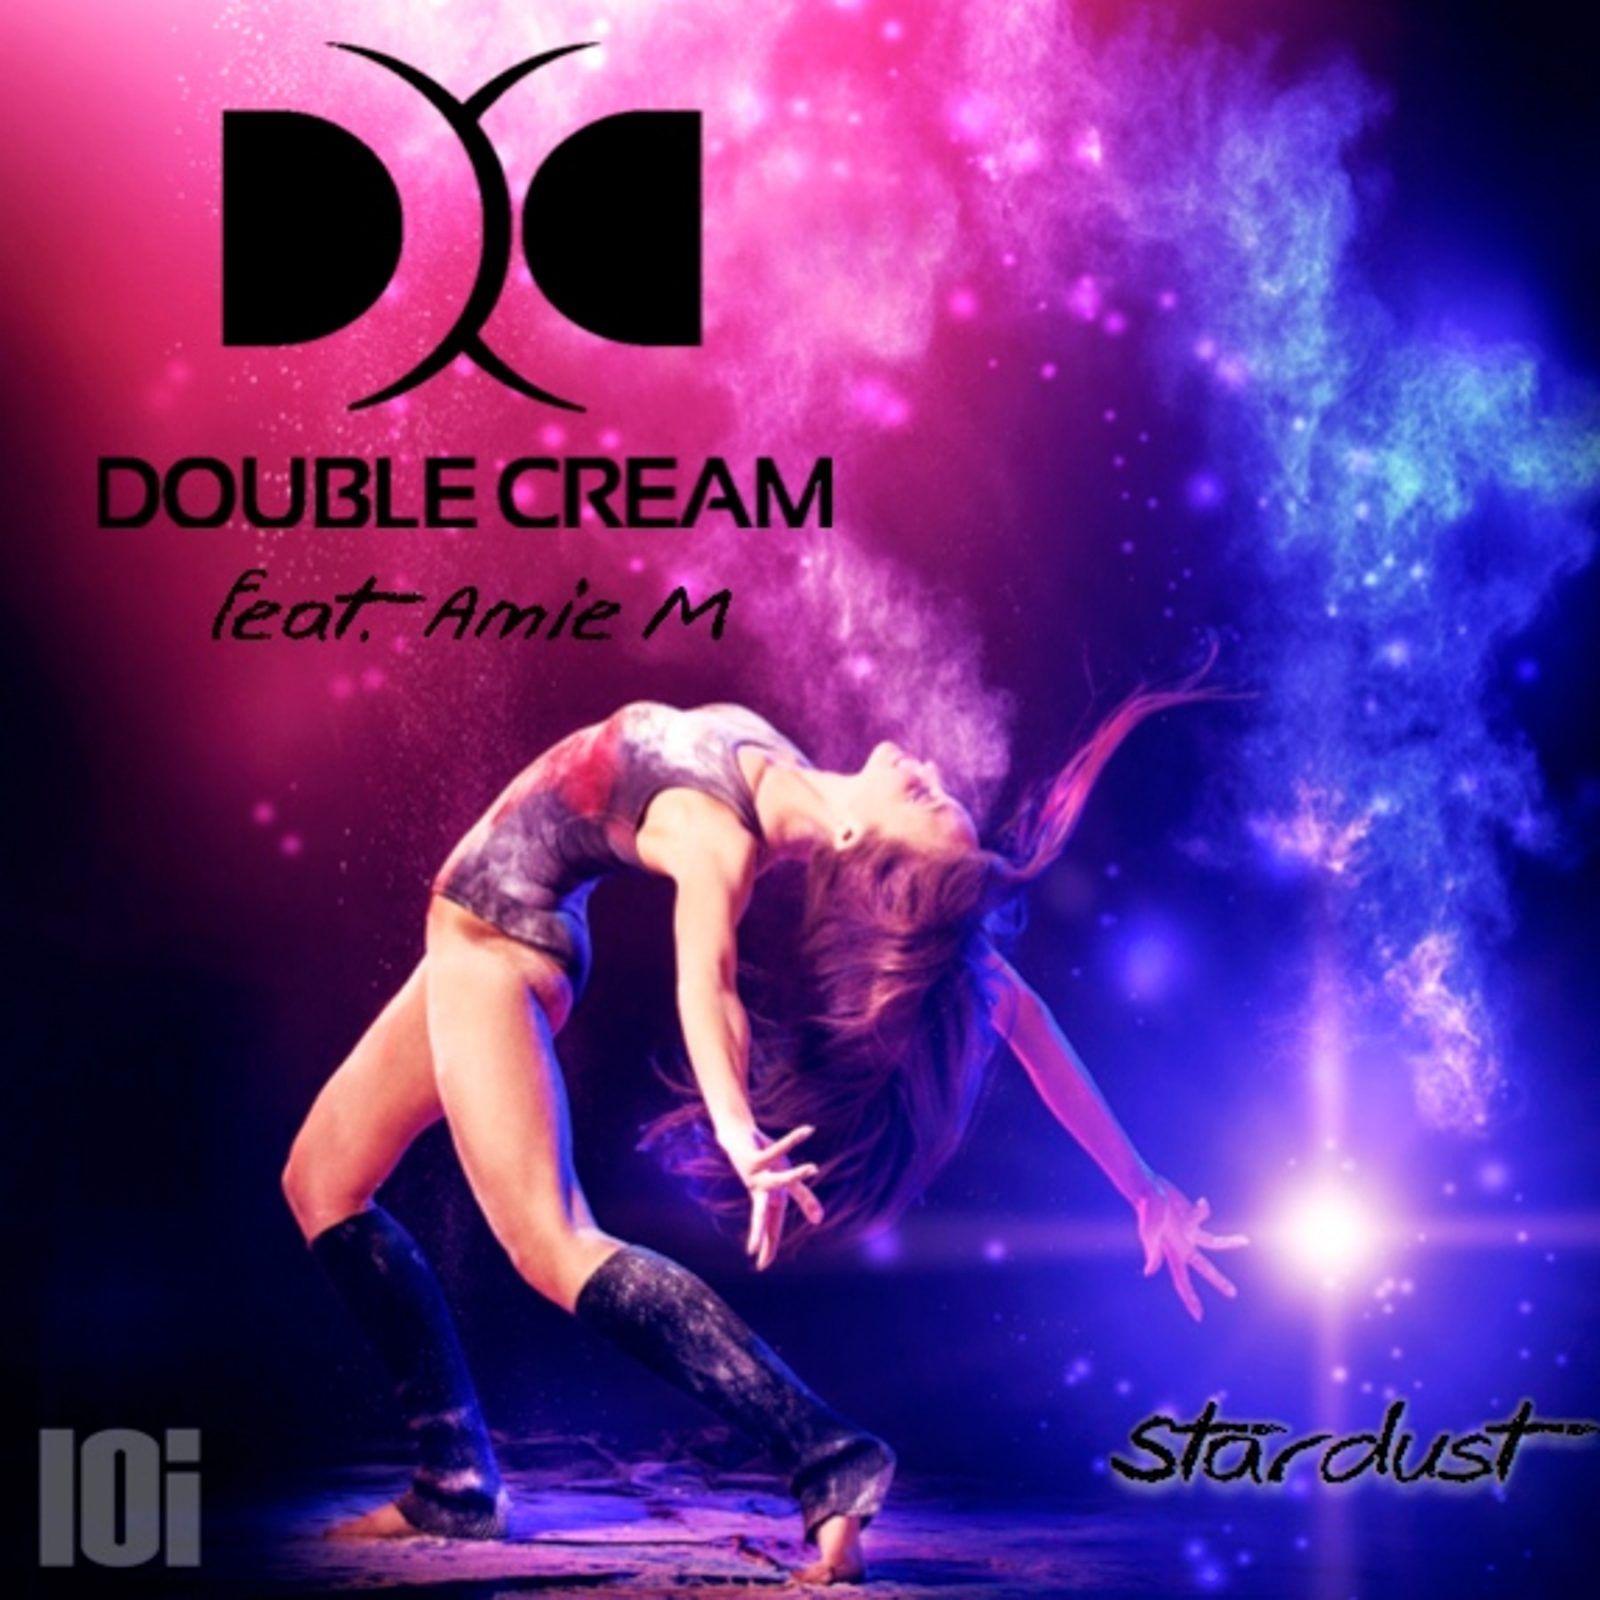 double-cream-feat-amie-m-stardust-loi-final.jpg